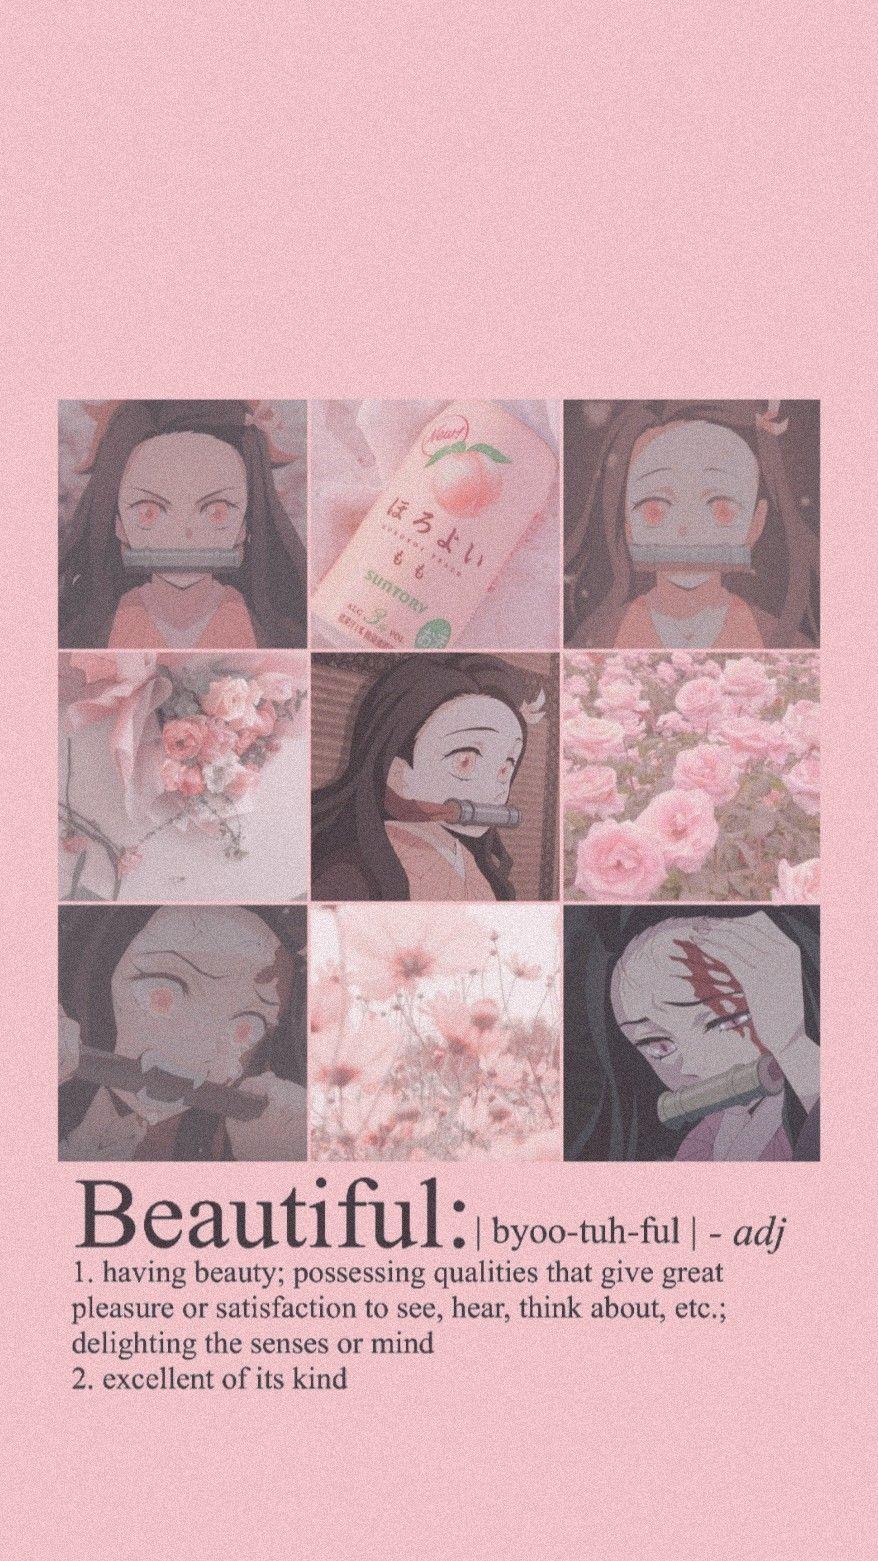 Kamado Nezuko Wallpaper Aesthetic Anime Cute Anime Wallpaper Anime Background Cute anime wallpaper collage